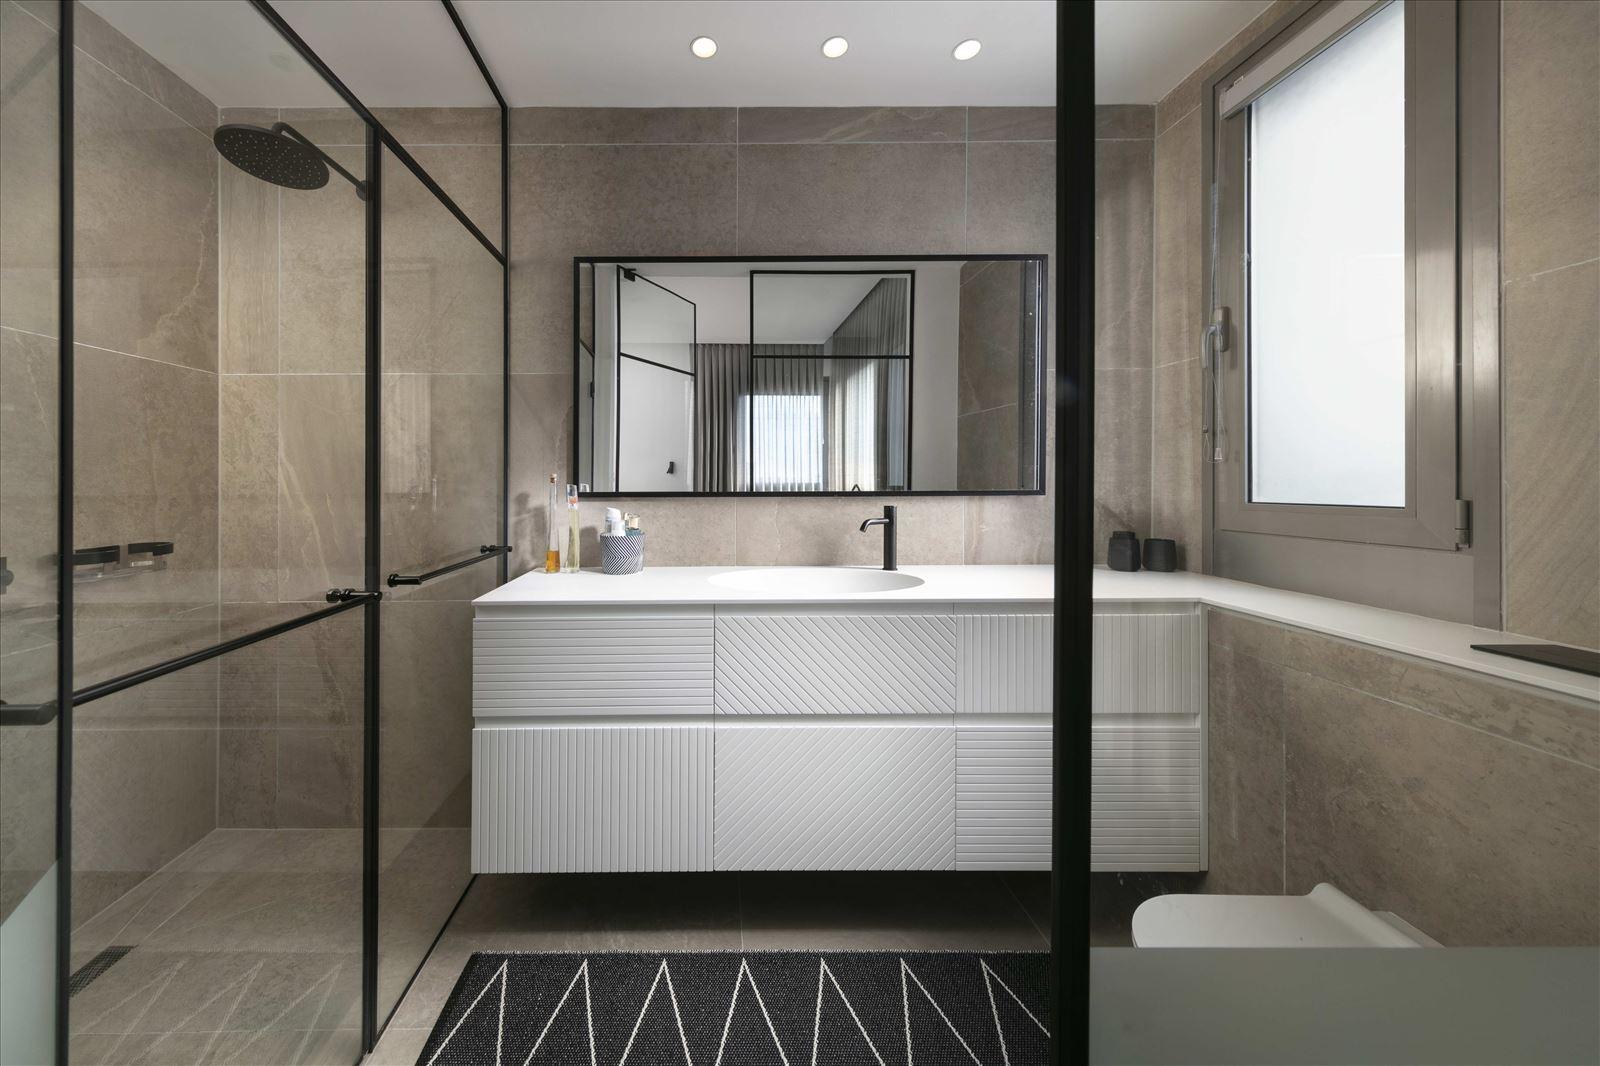 Private home - Herzliya תאורה בחדר האמבטיה נעשתה על ידי קמחי תאורה